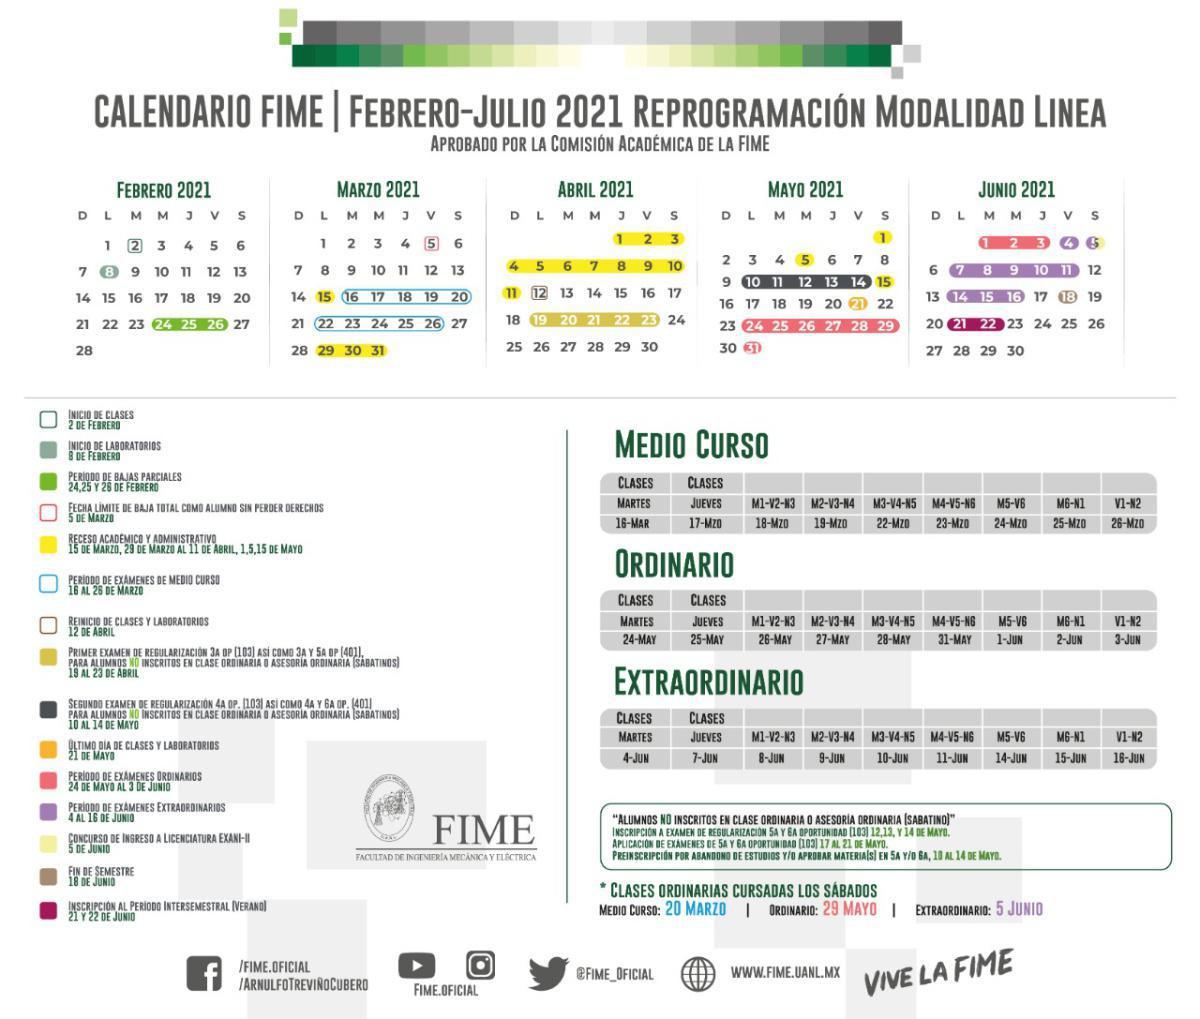 Calendario Febrero-Junio 2021